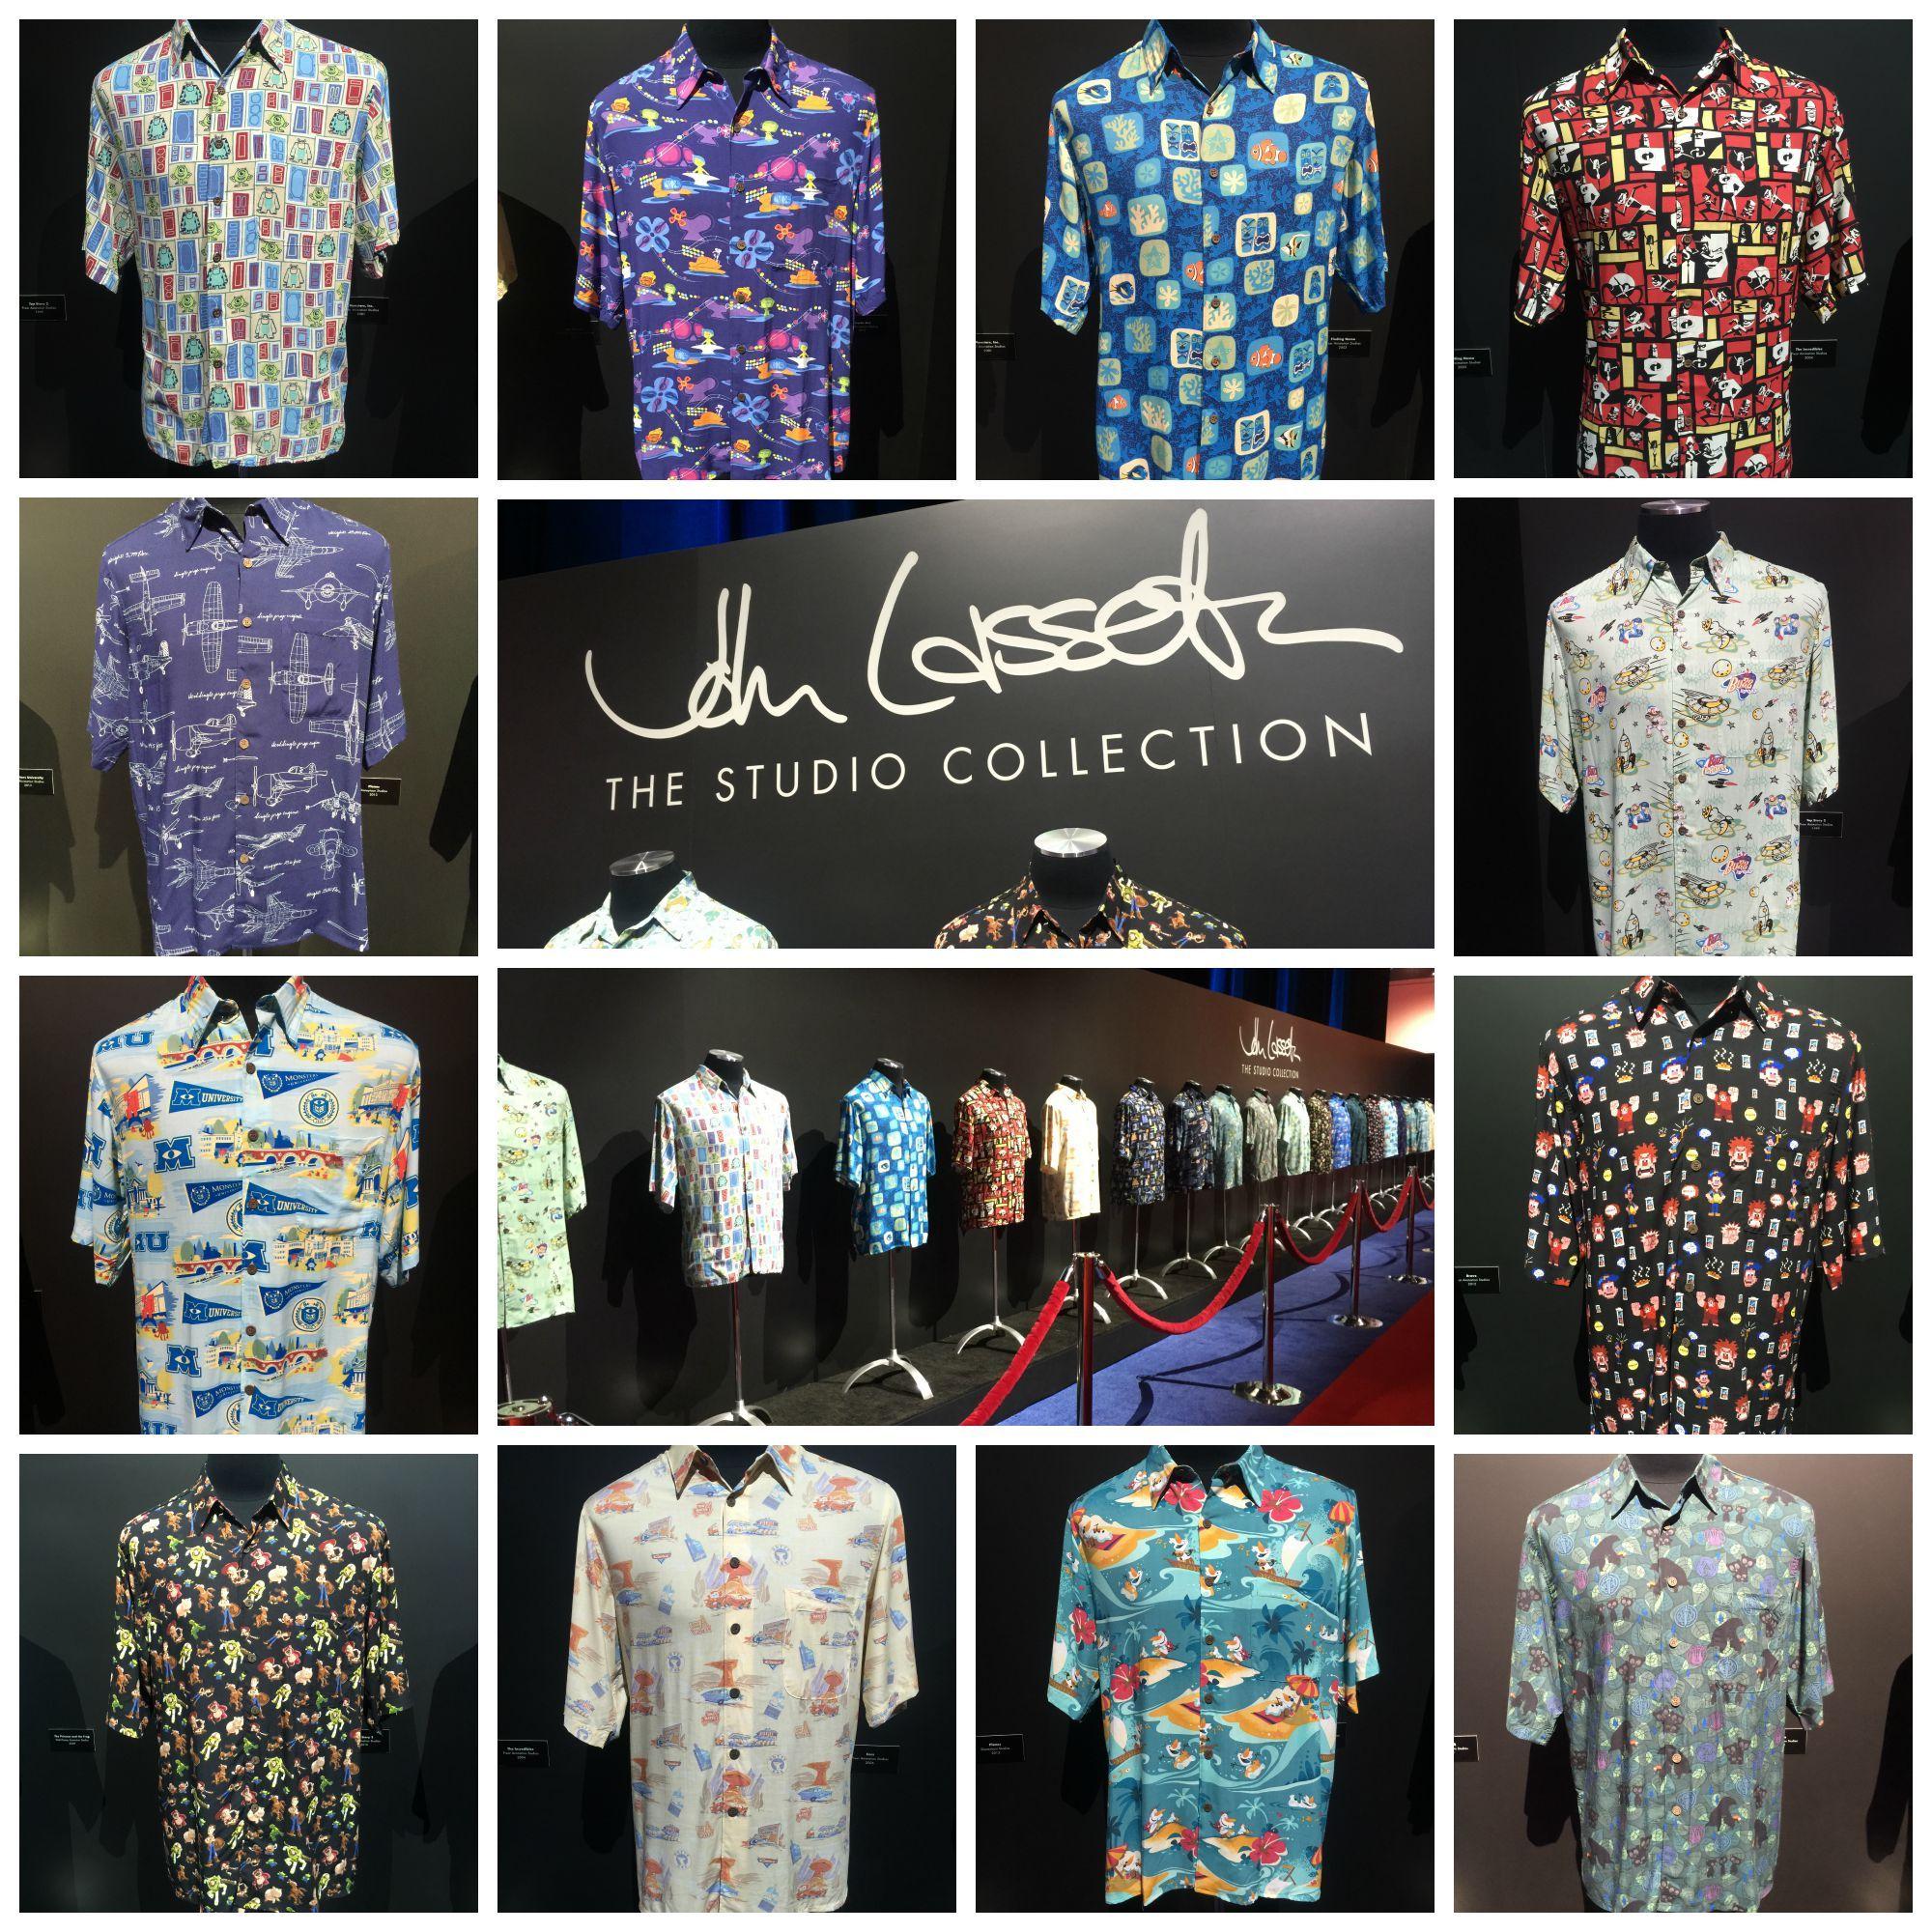 John Lasseter s Studio Hawaiian Shirt Collection. I would love these Disney  Hawaiian shirts for costumes. b5dd8958d